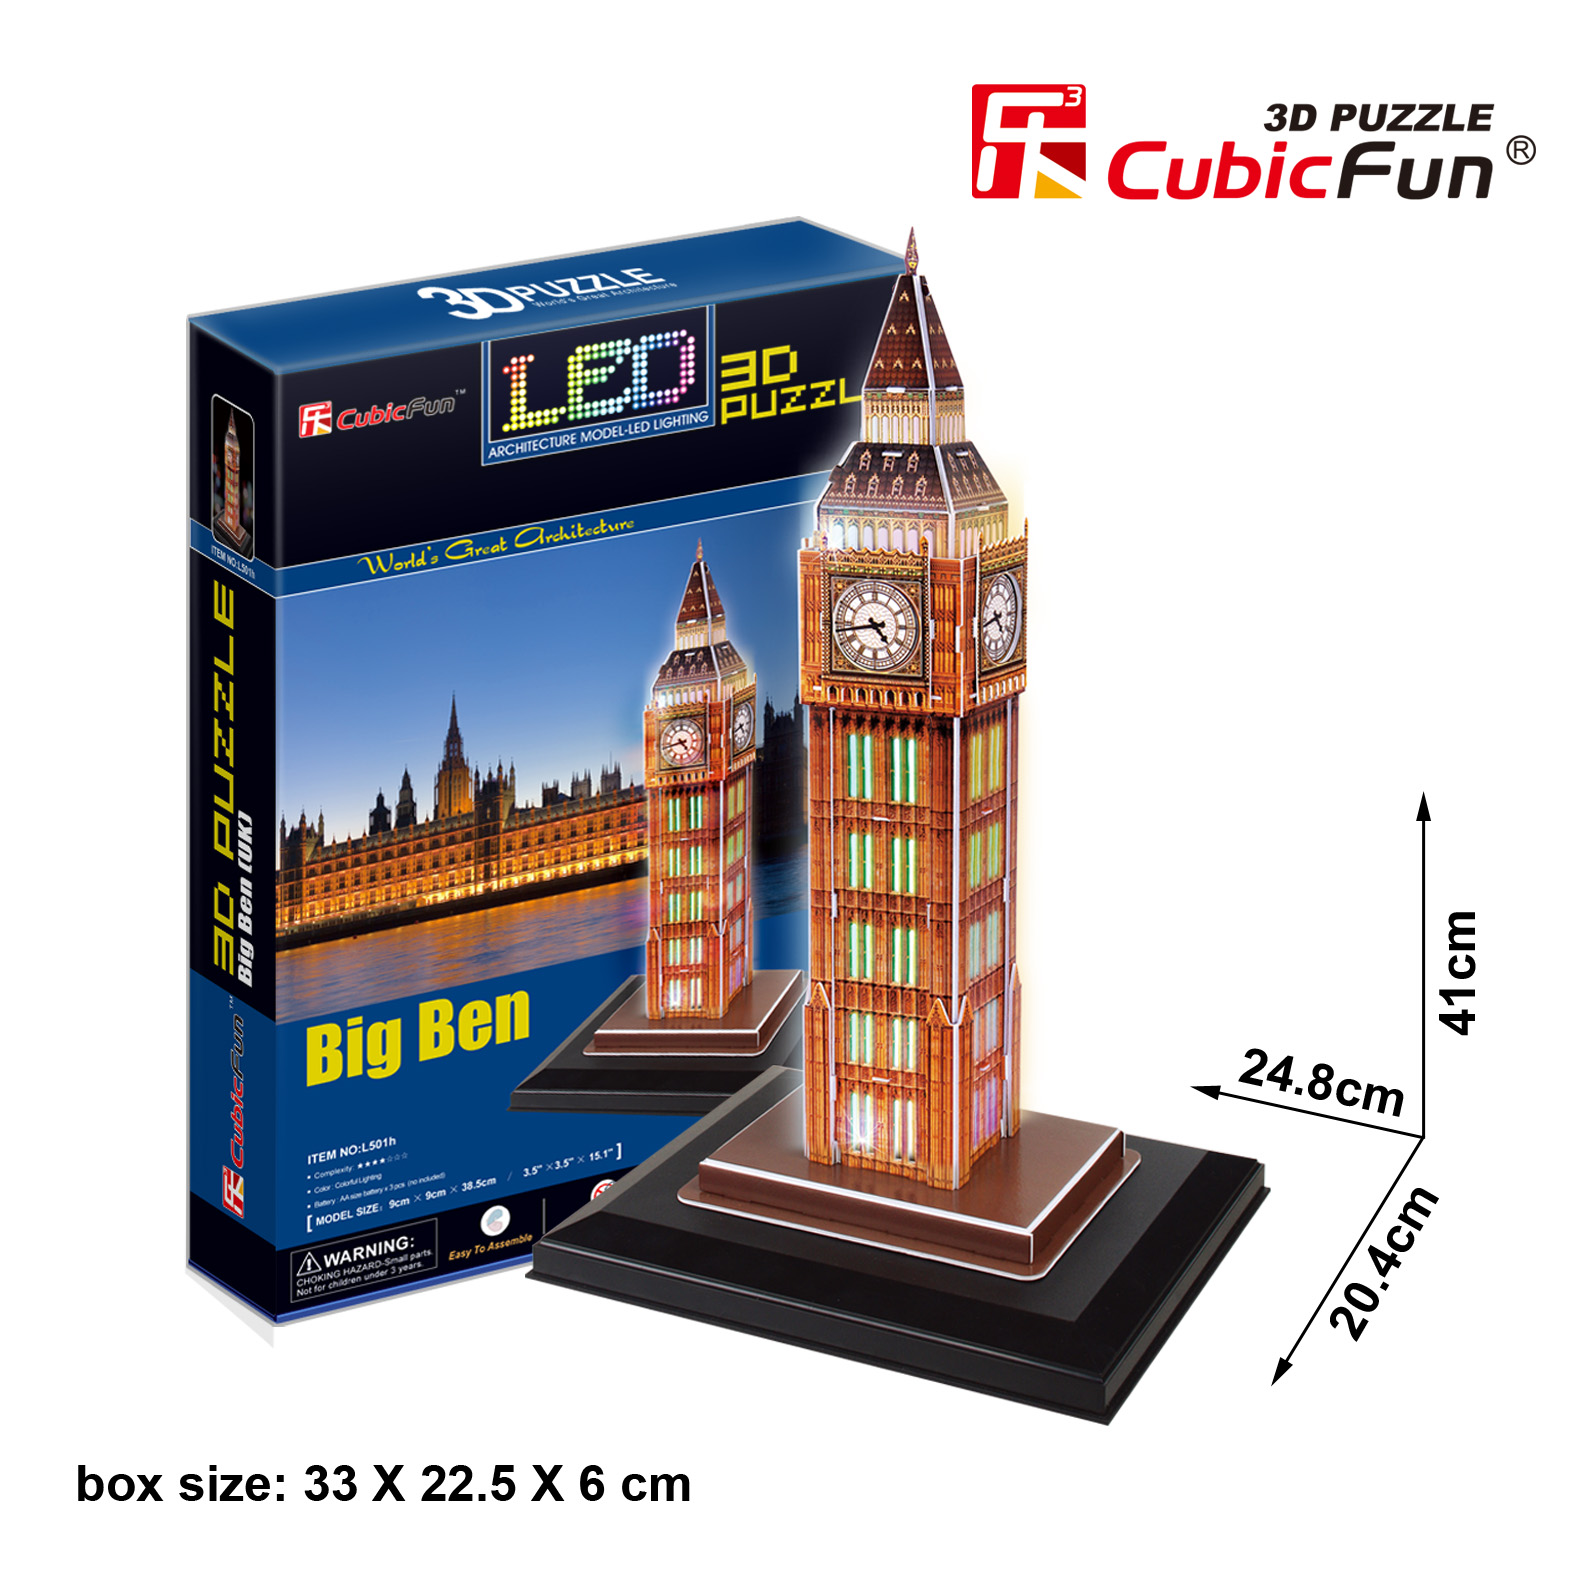 CUBICFUN Big Ben